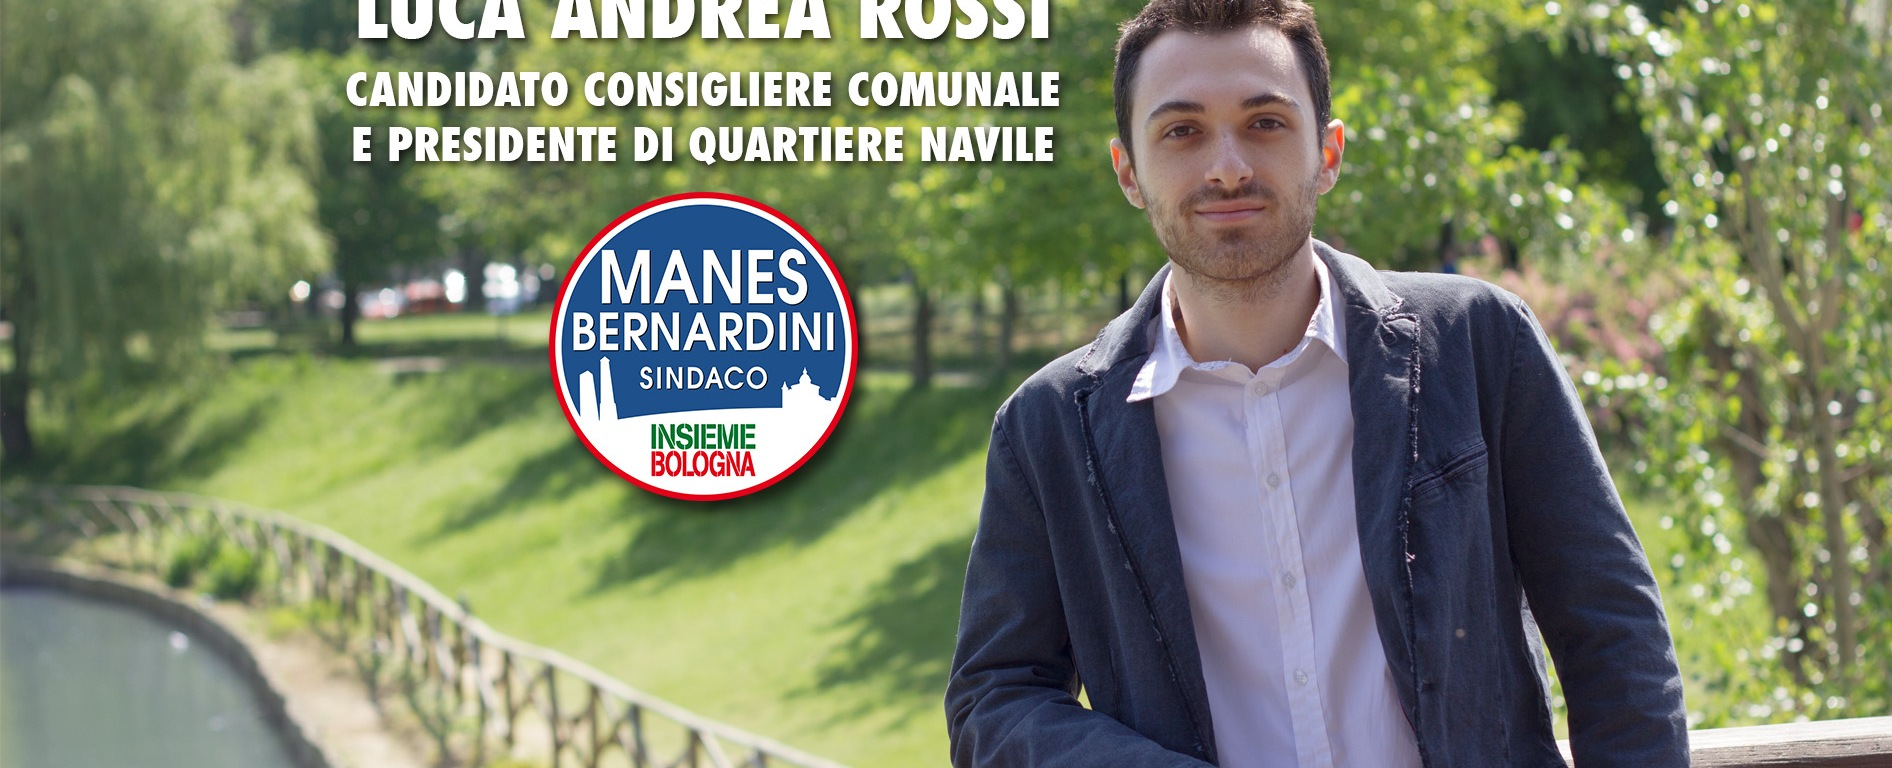 Luca Andrea Rossi- Insieme Bologna